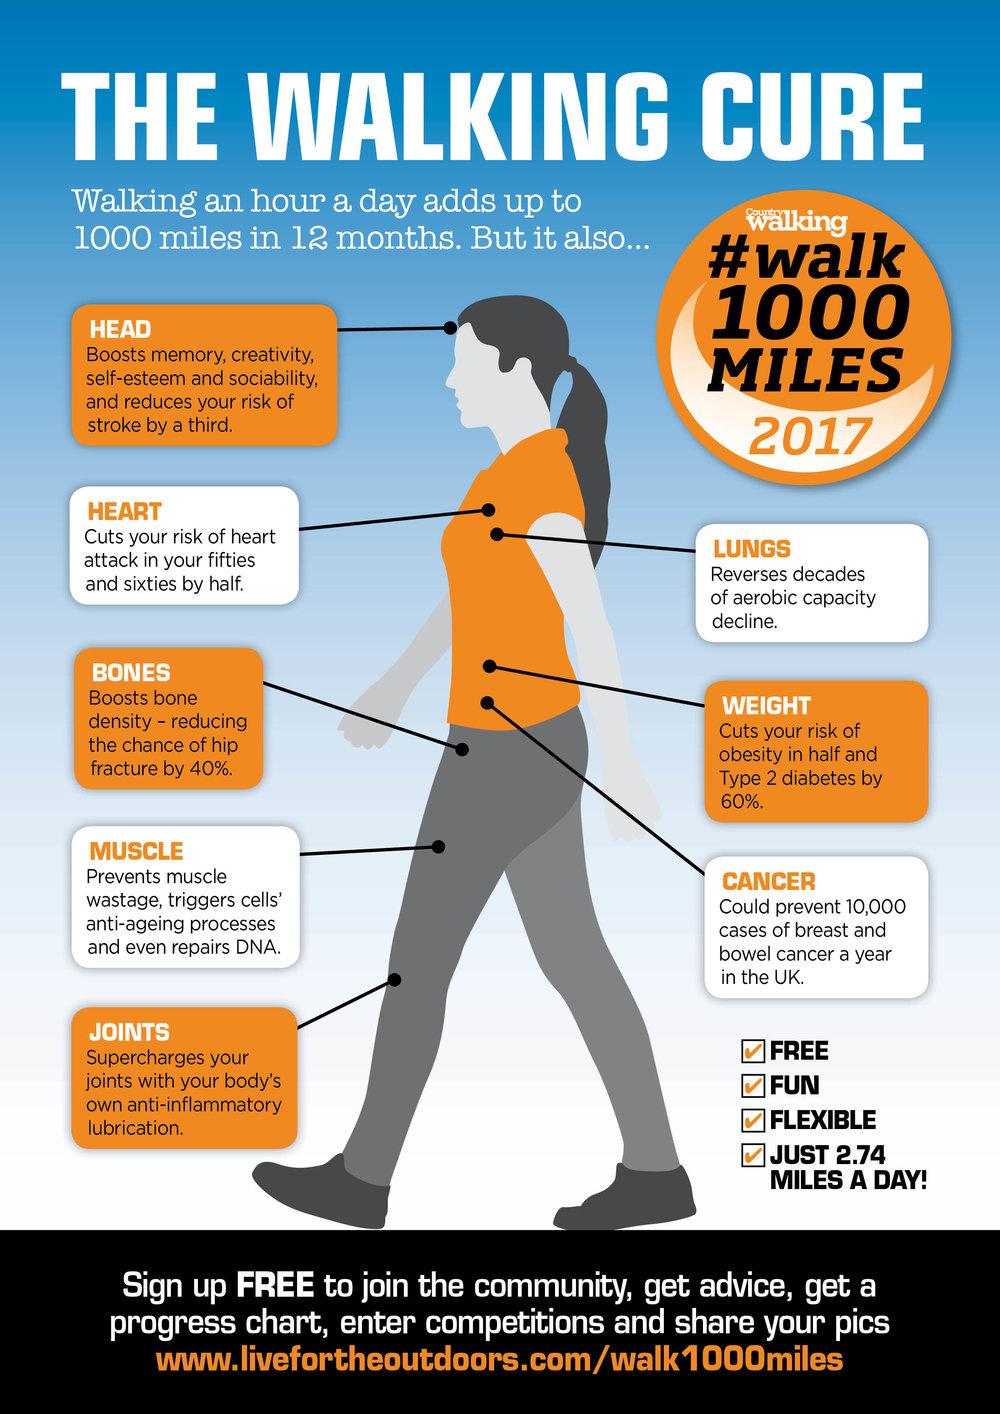 #walk1000miles 2017 poster3.jpg